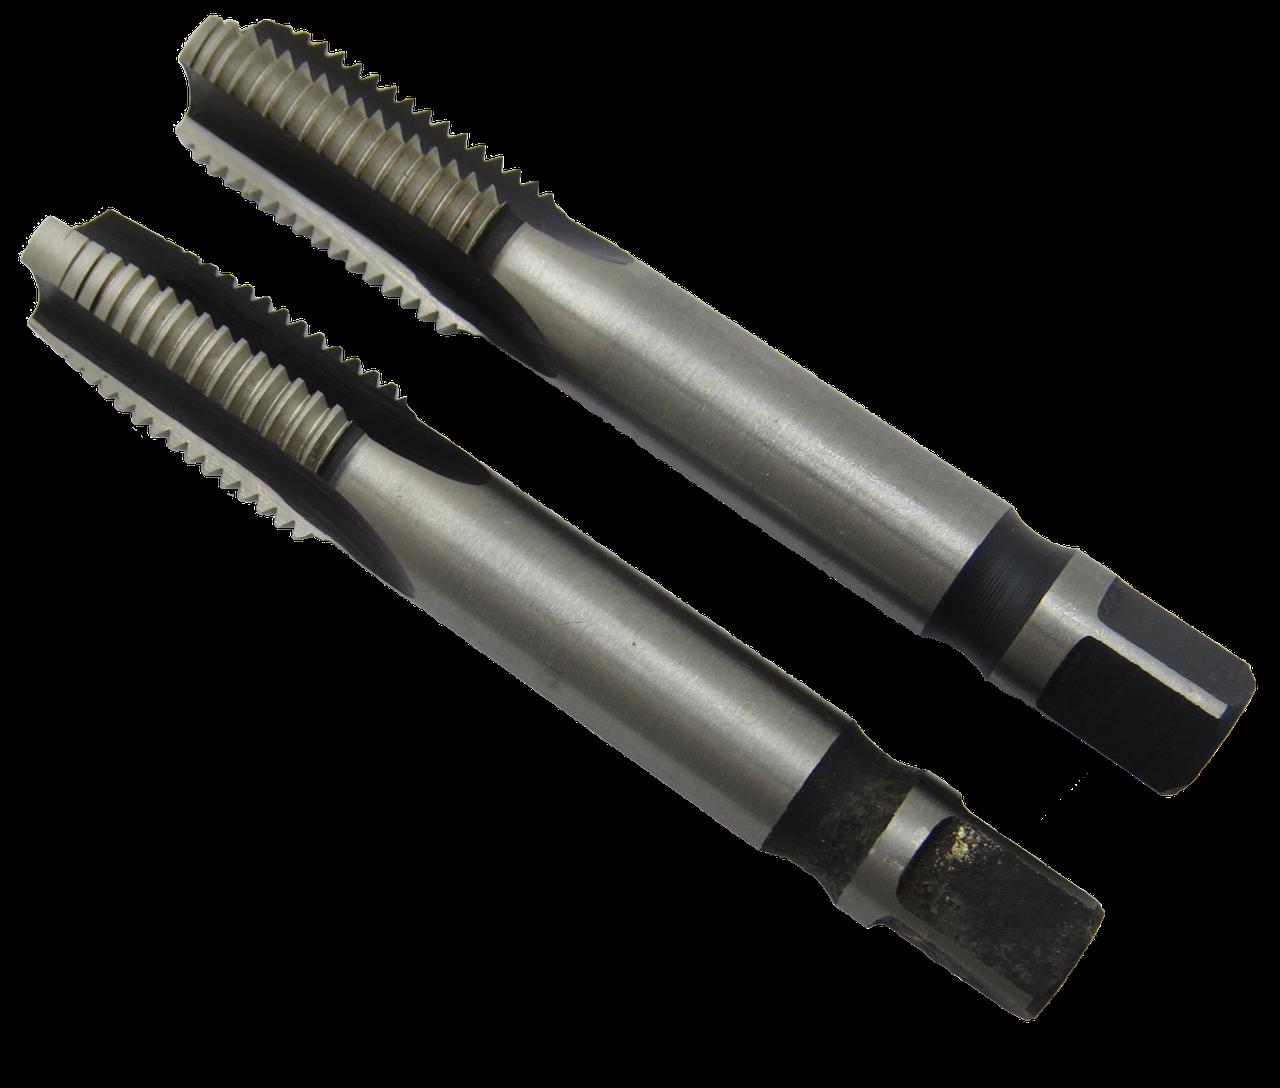 Метчик машинно-ручной М39х3 Р6М5 комплект из 2х штук